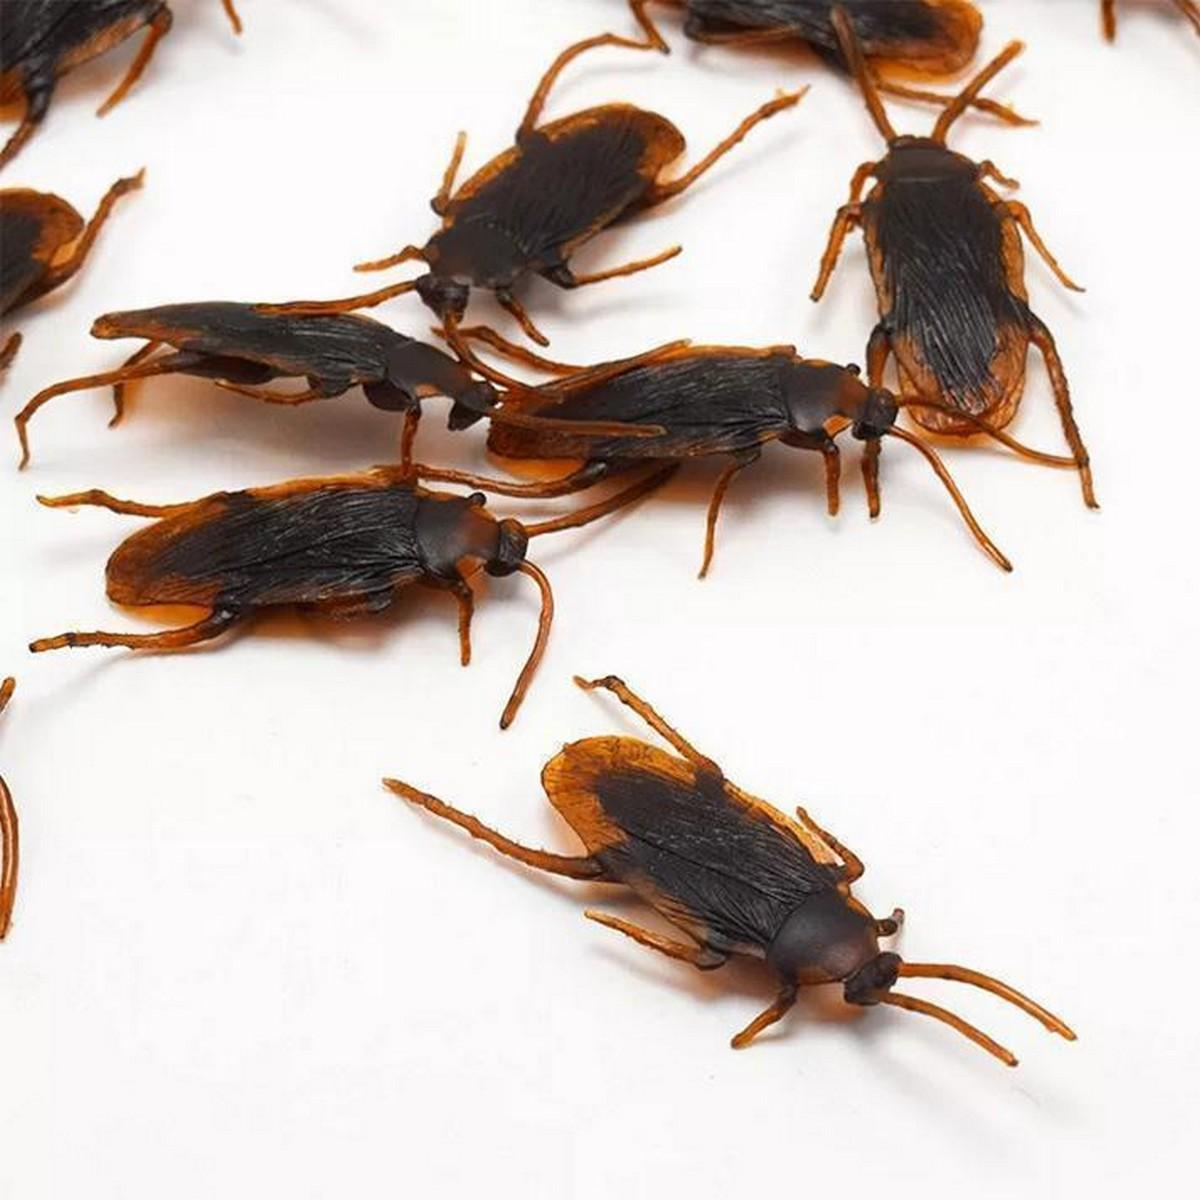 Pack of 12 Pcs - Halloween Gadget Plastic Bugs Cockroaches - Joke Decoration Rubber Toy